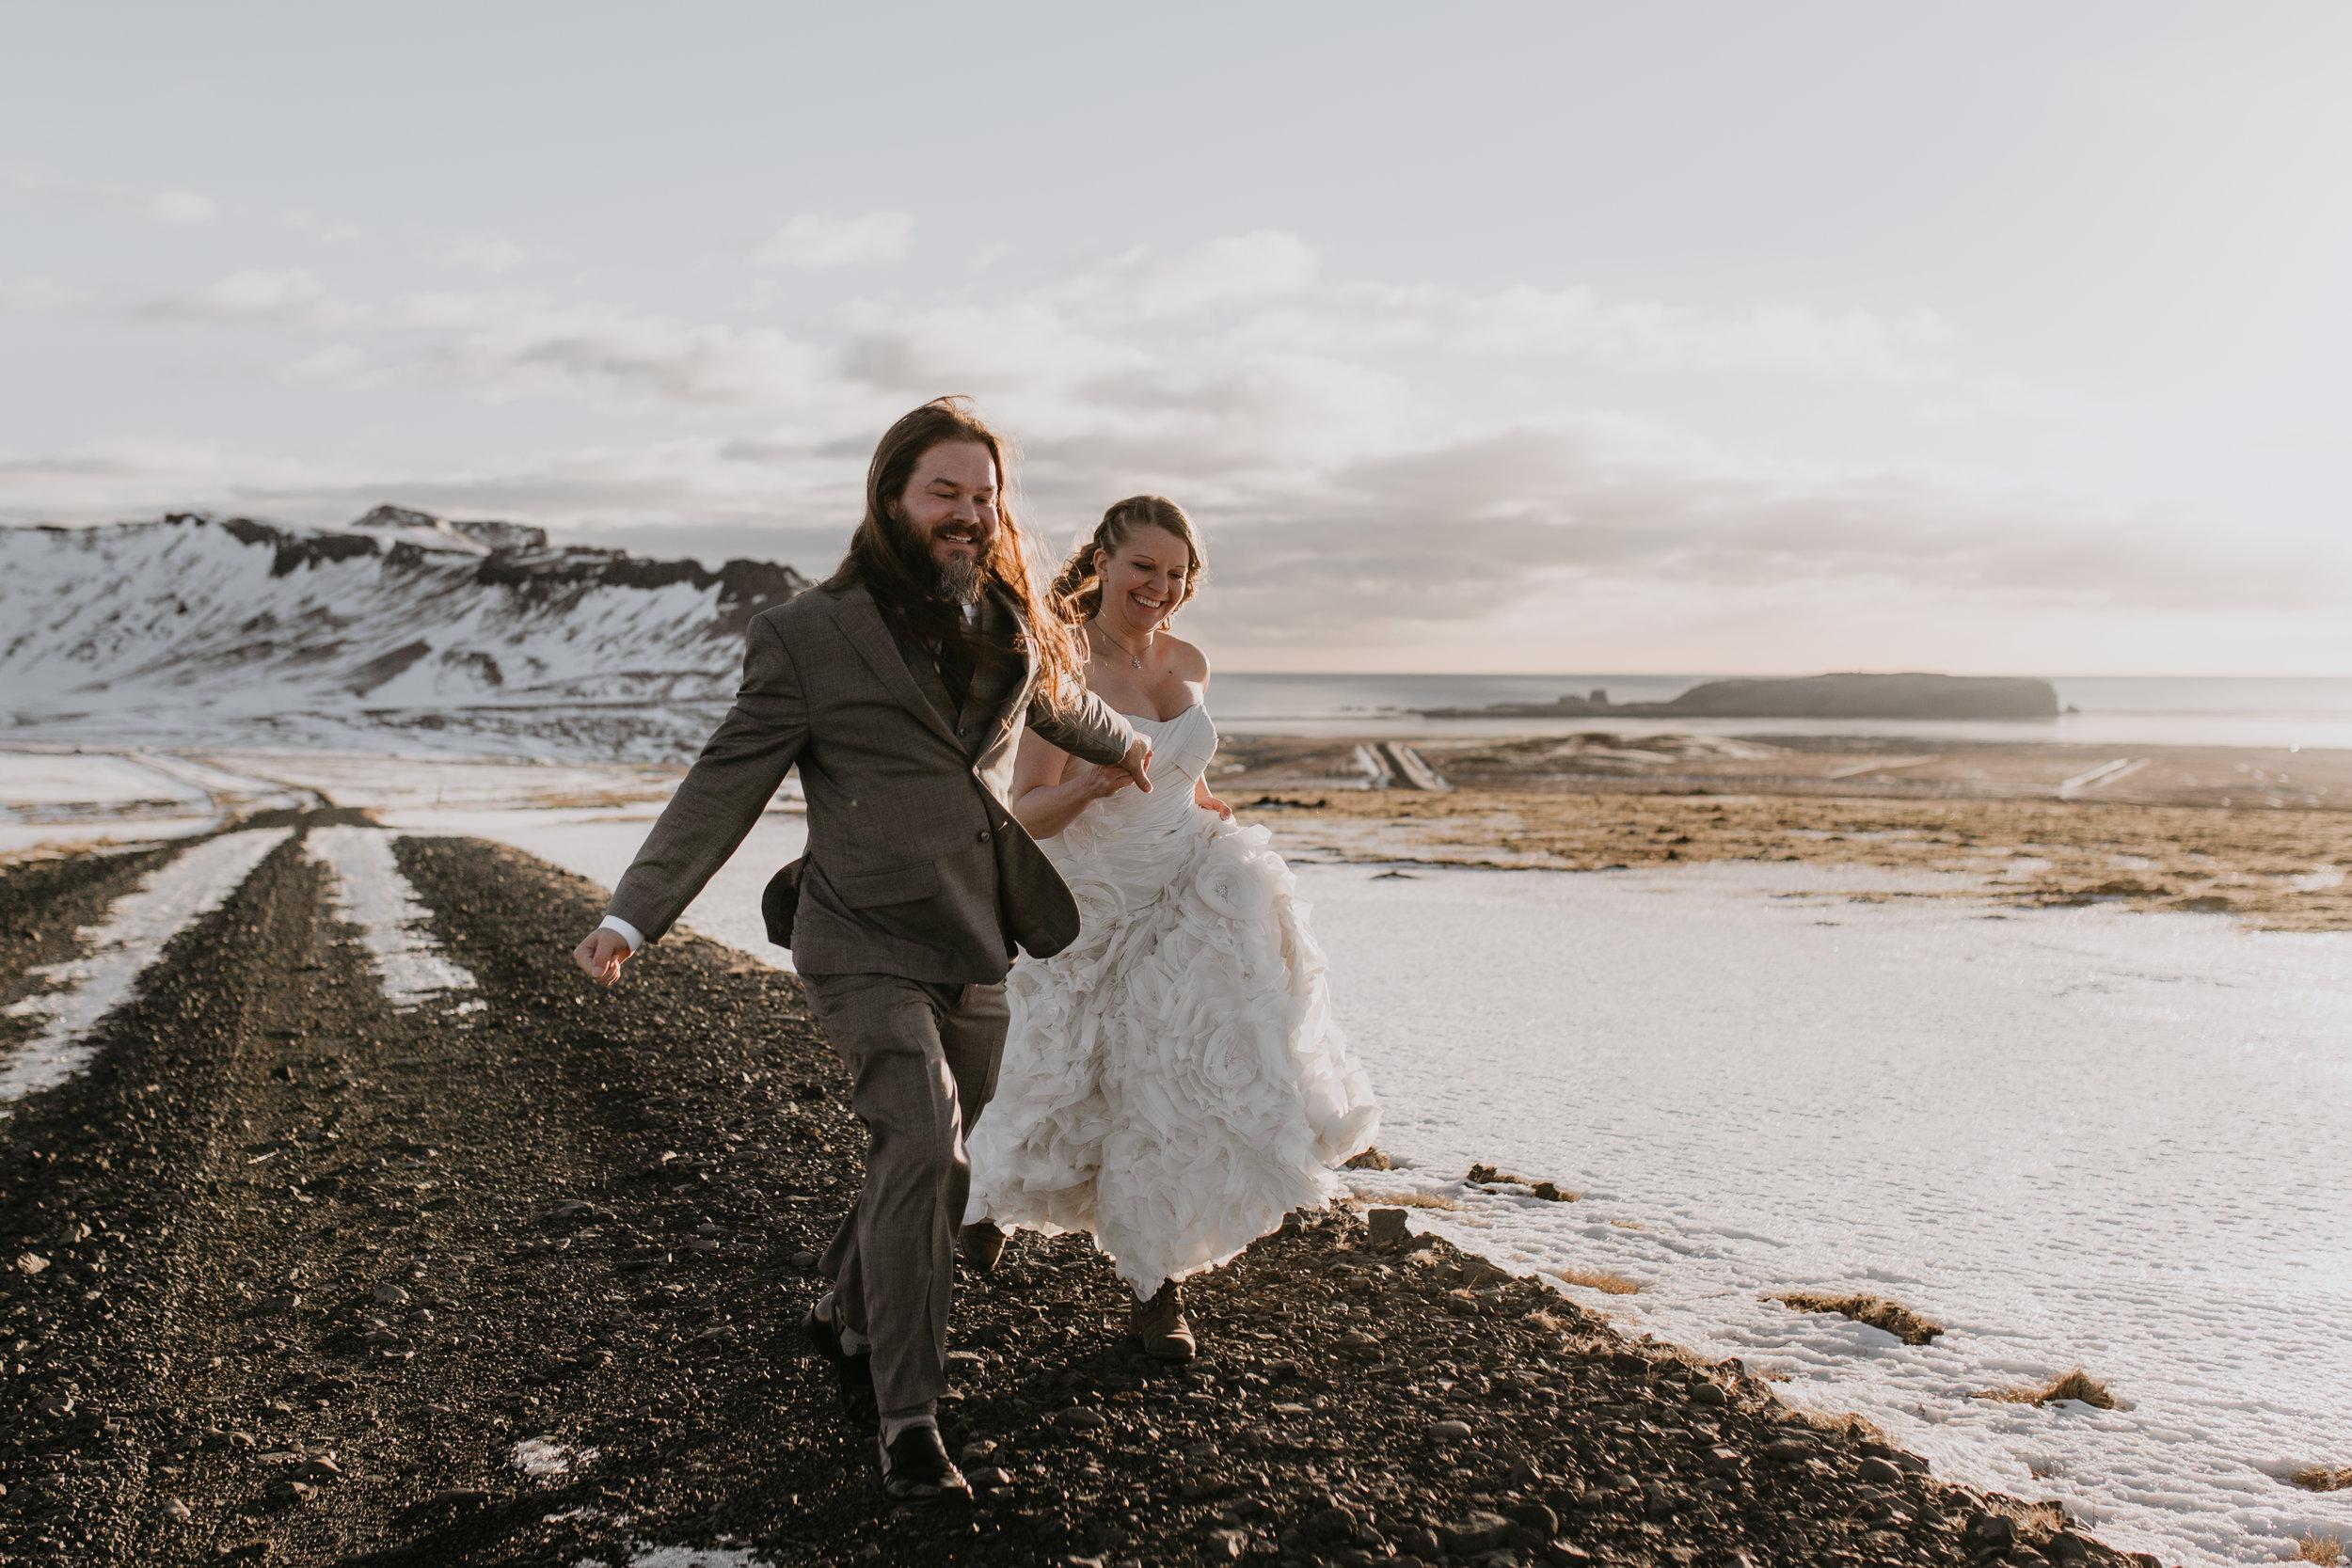 nicole-daacke-photography-iceland-winter-sunset-adventure-elopement-skogafoss-waterfall-black-sand-beach-dyrholaey-vik-iceland-intimate-wedding-black-church-elopement-photographer-15.jpg